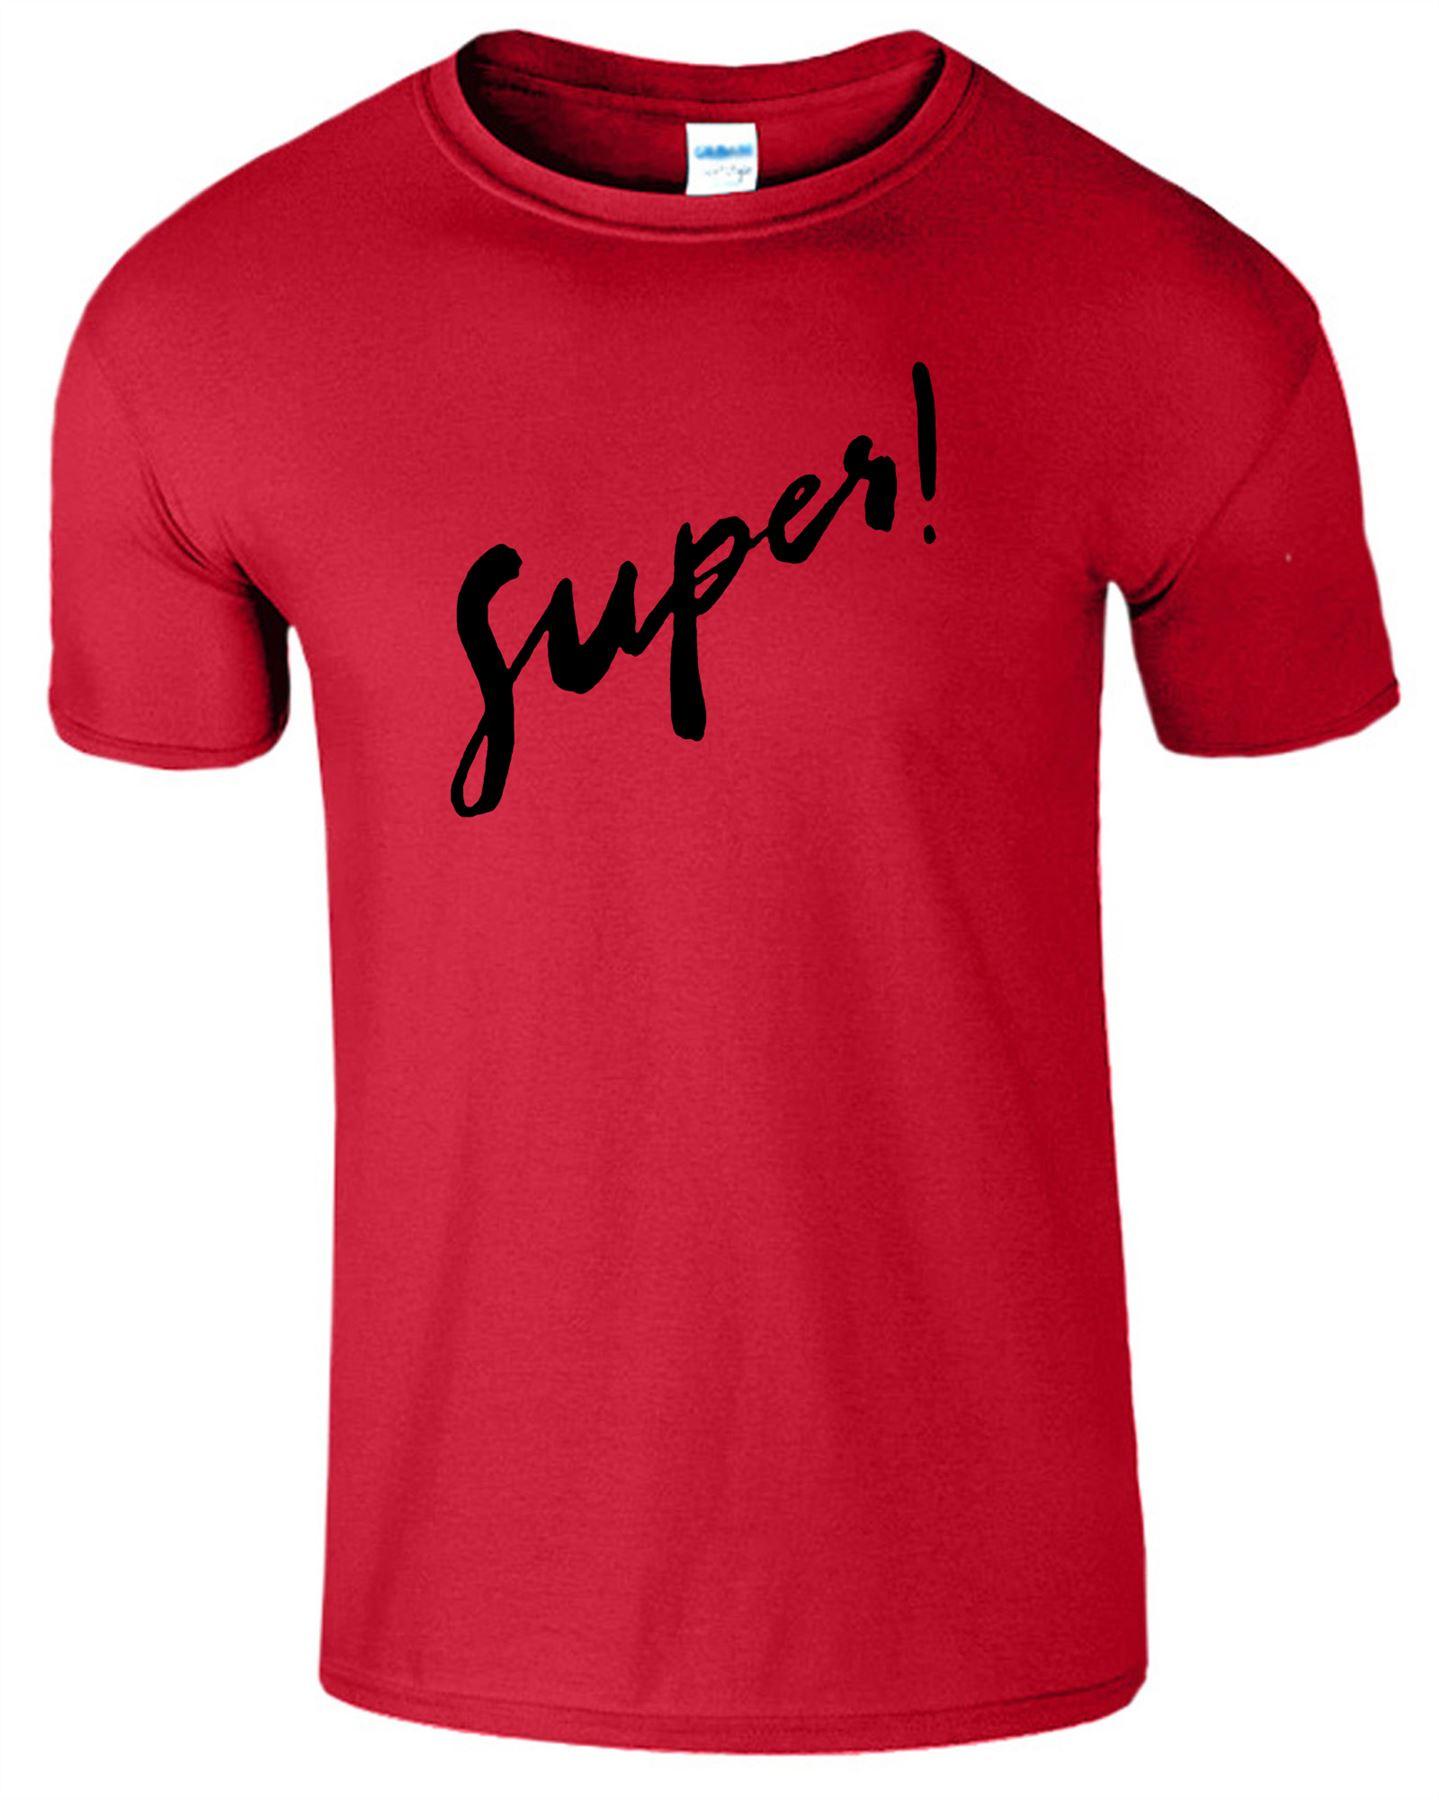 Super Mens T Shirt Casual Workout Gym Fancy Crew Neck Ladies Fit Top Tee T-Shirt